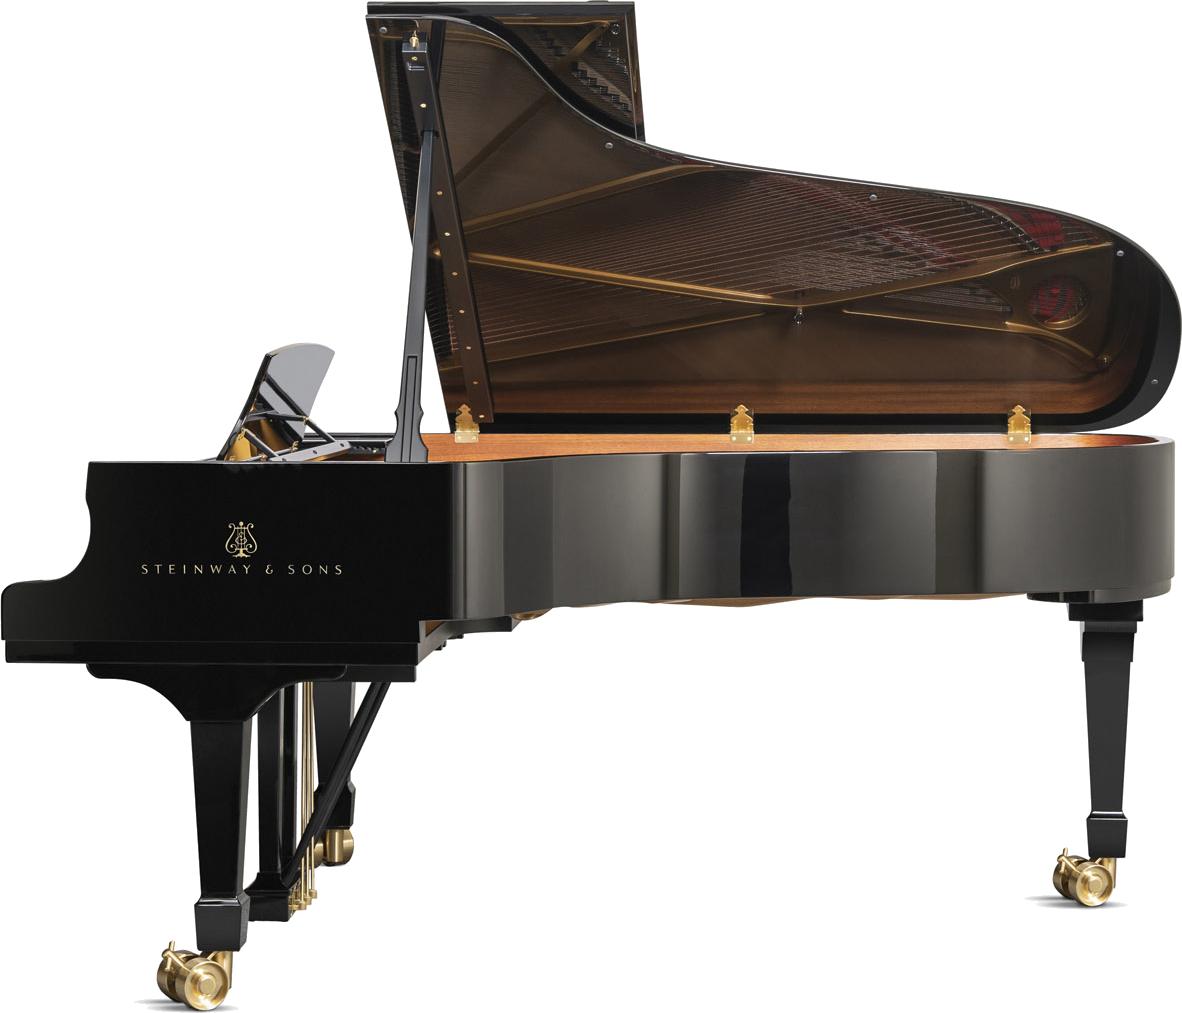 piano-cola-steinway-sons-c227-artesanal-nuevo-negro-lateral